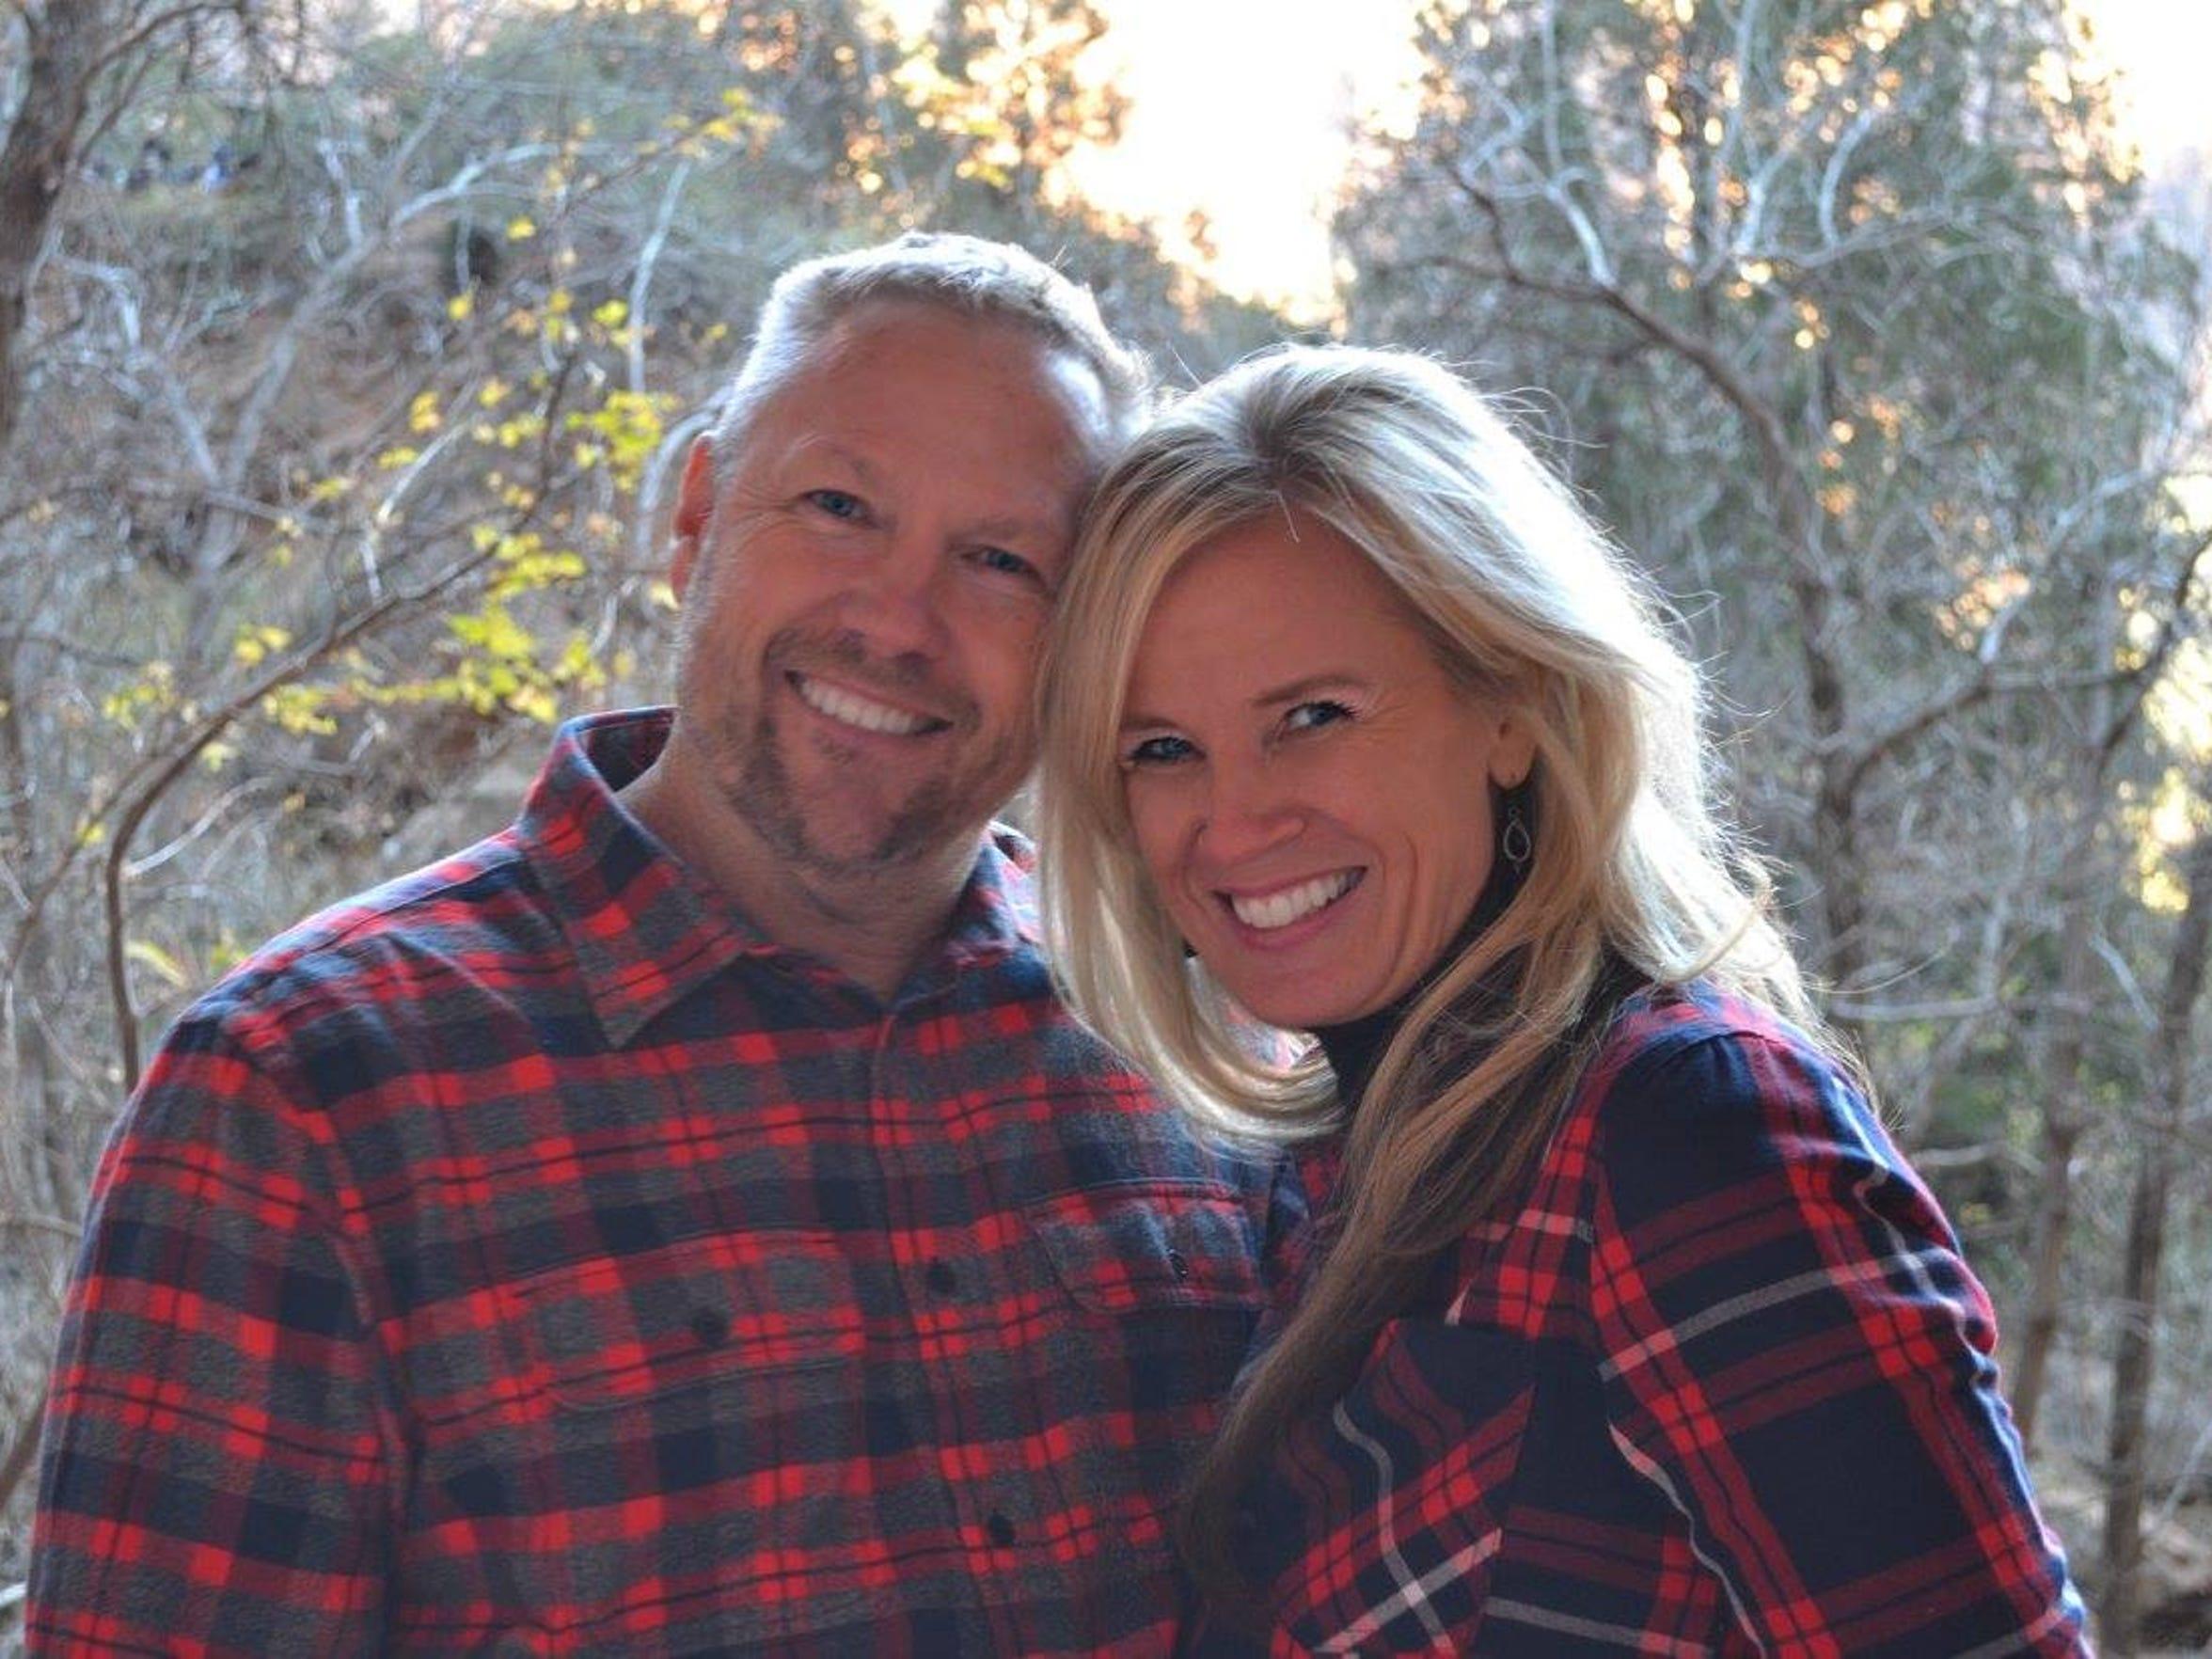 Macin Smith's parents, Darren Smith and Tracey Bratt-Smith